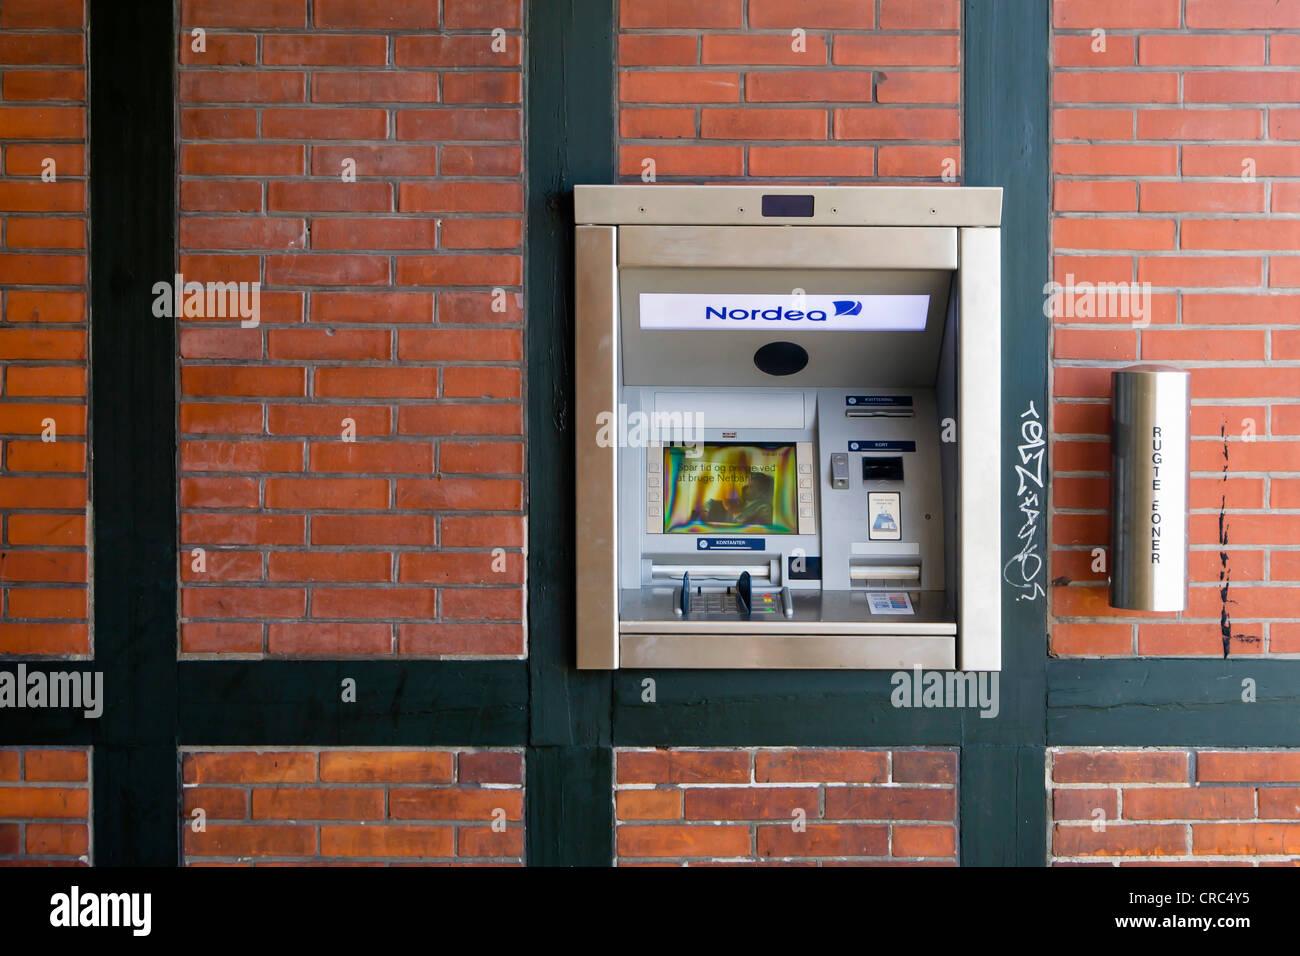 Modern cash dispenser built into a half-timbering wall, Copenhagen, Denmark, Europe - Stock Image